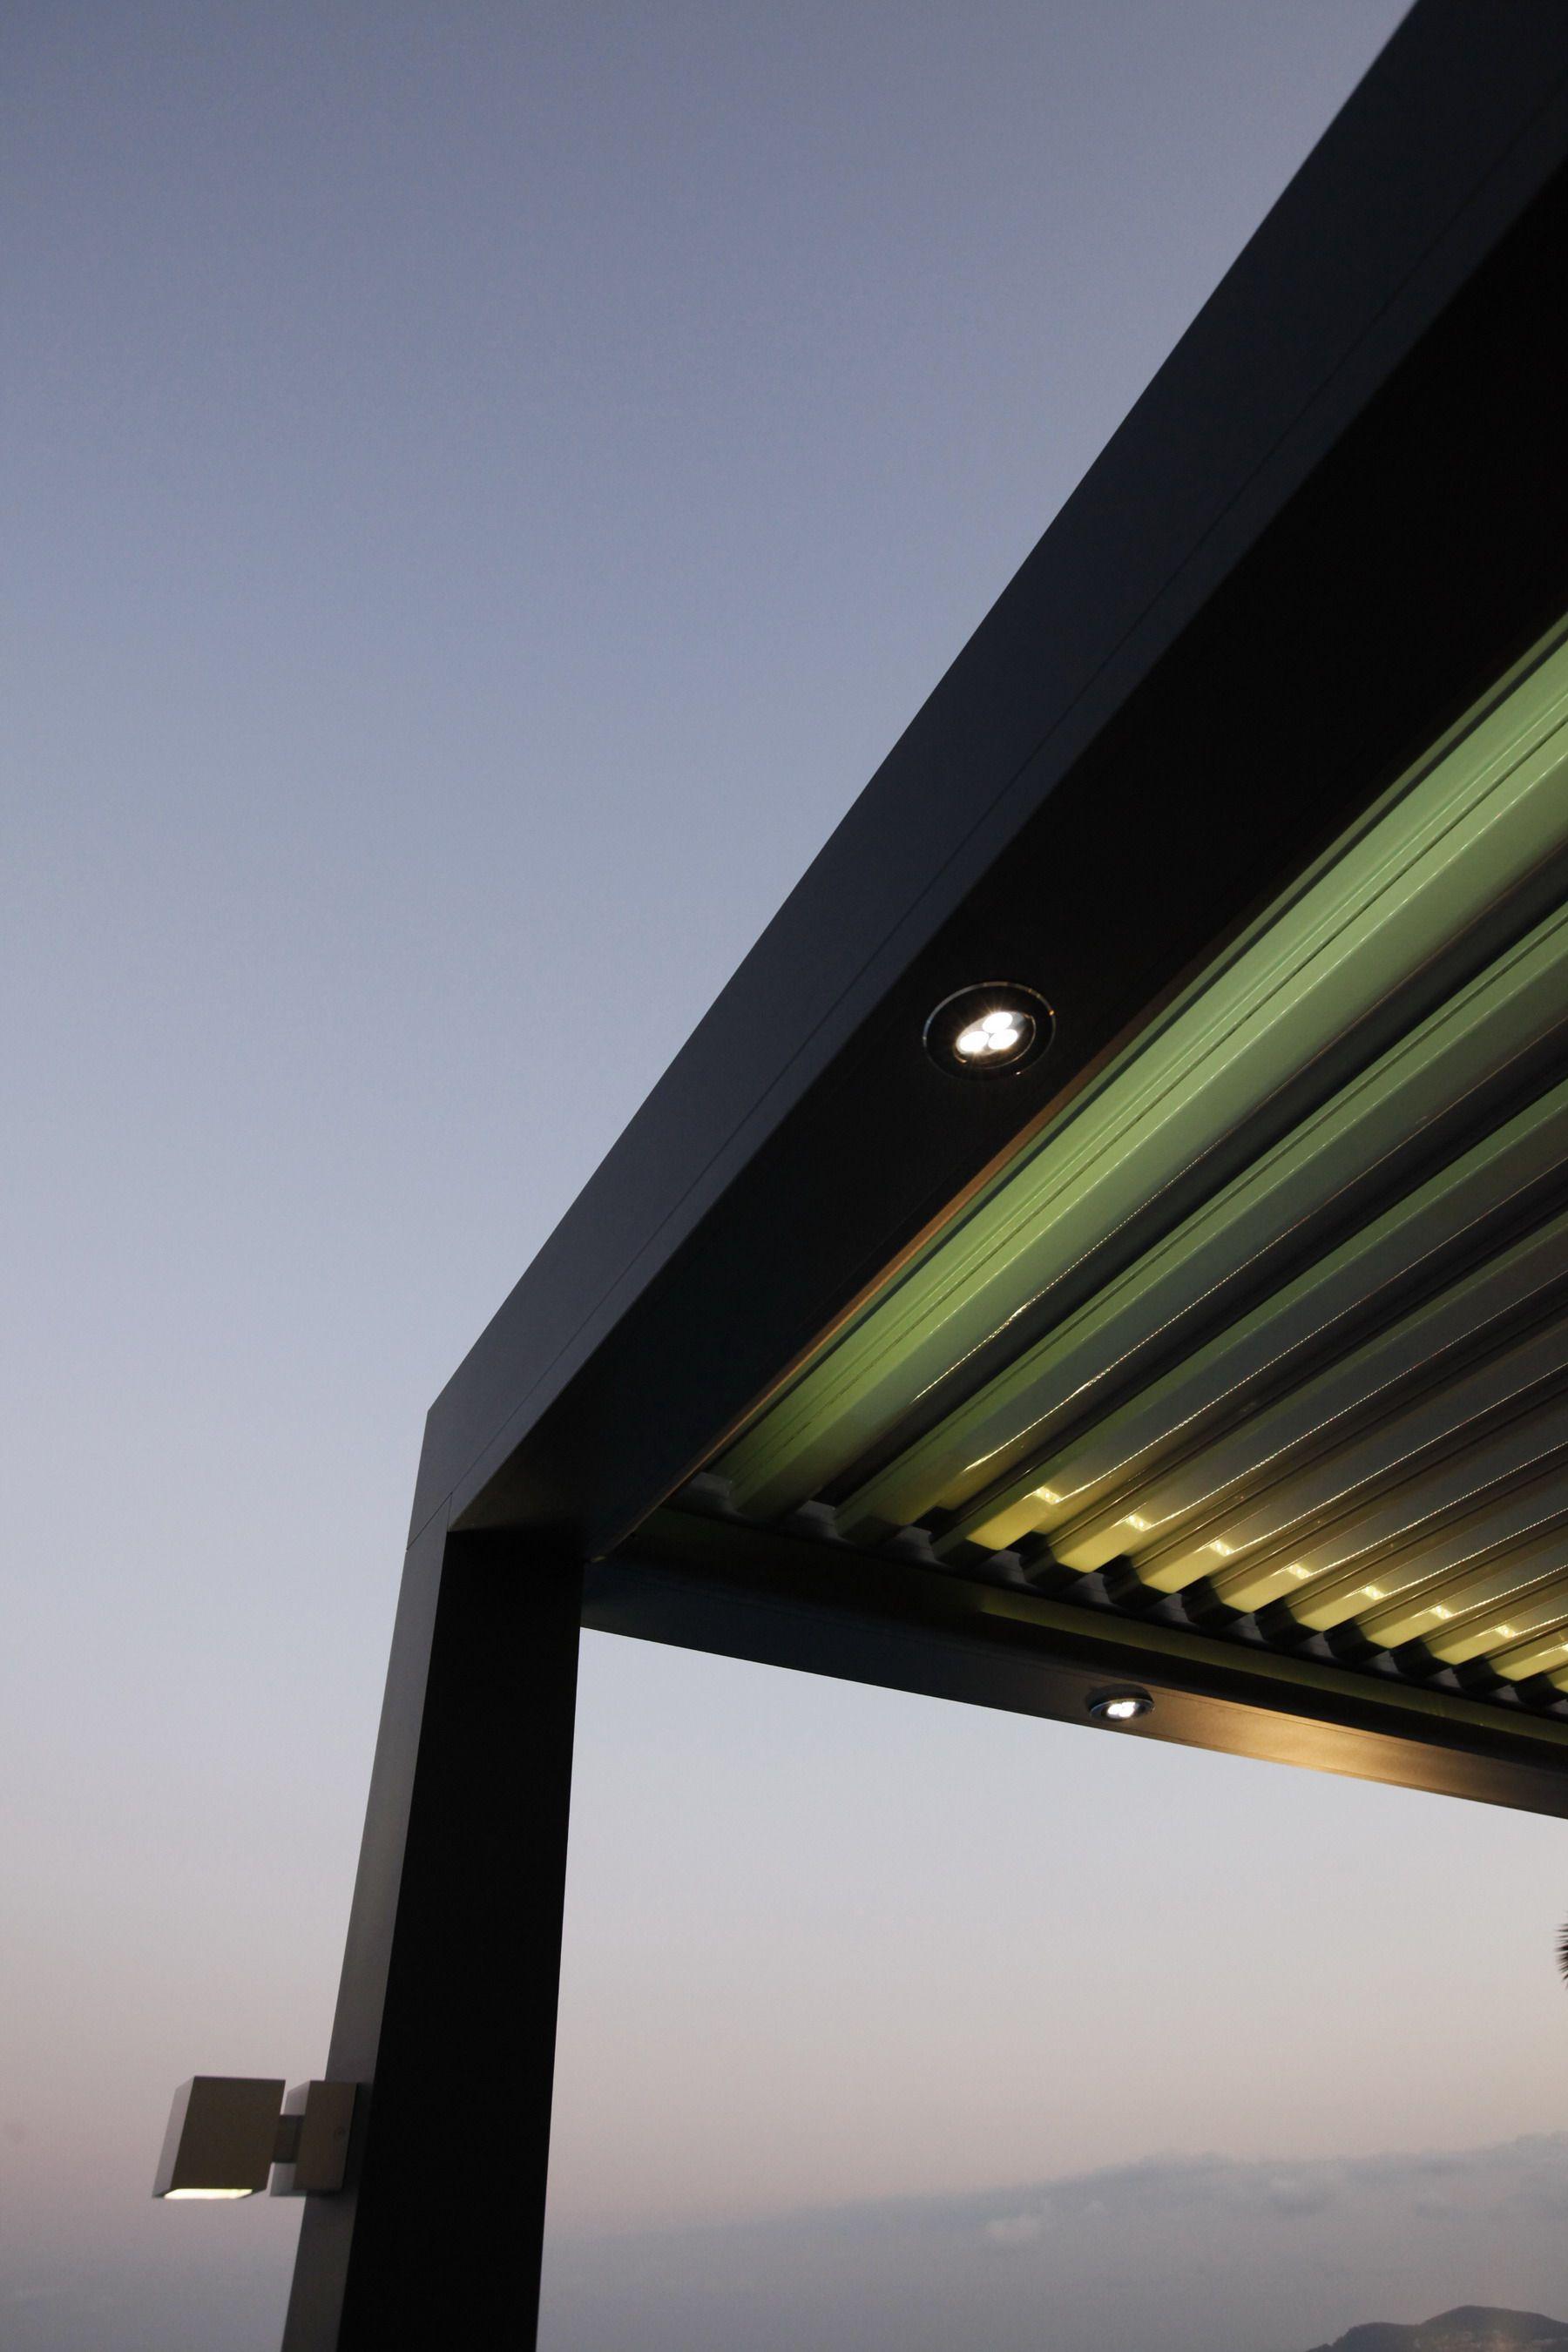 Pin de biossun catalunya en iluminaci n con tiras led - Iluminacion tiras led ...